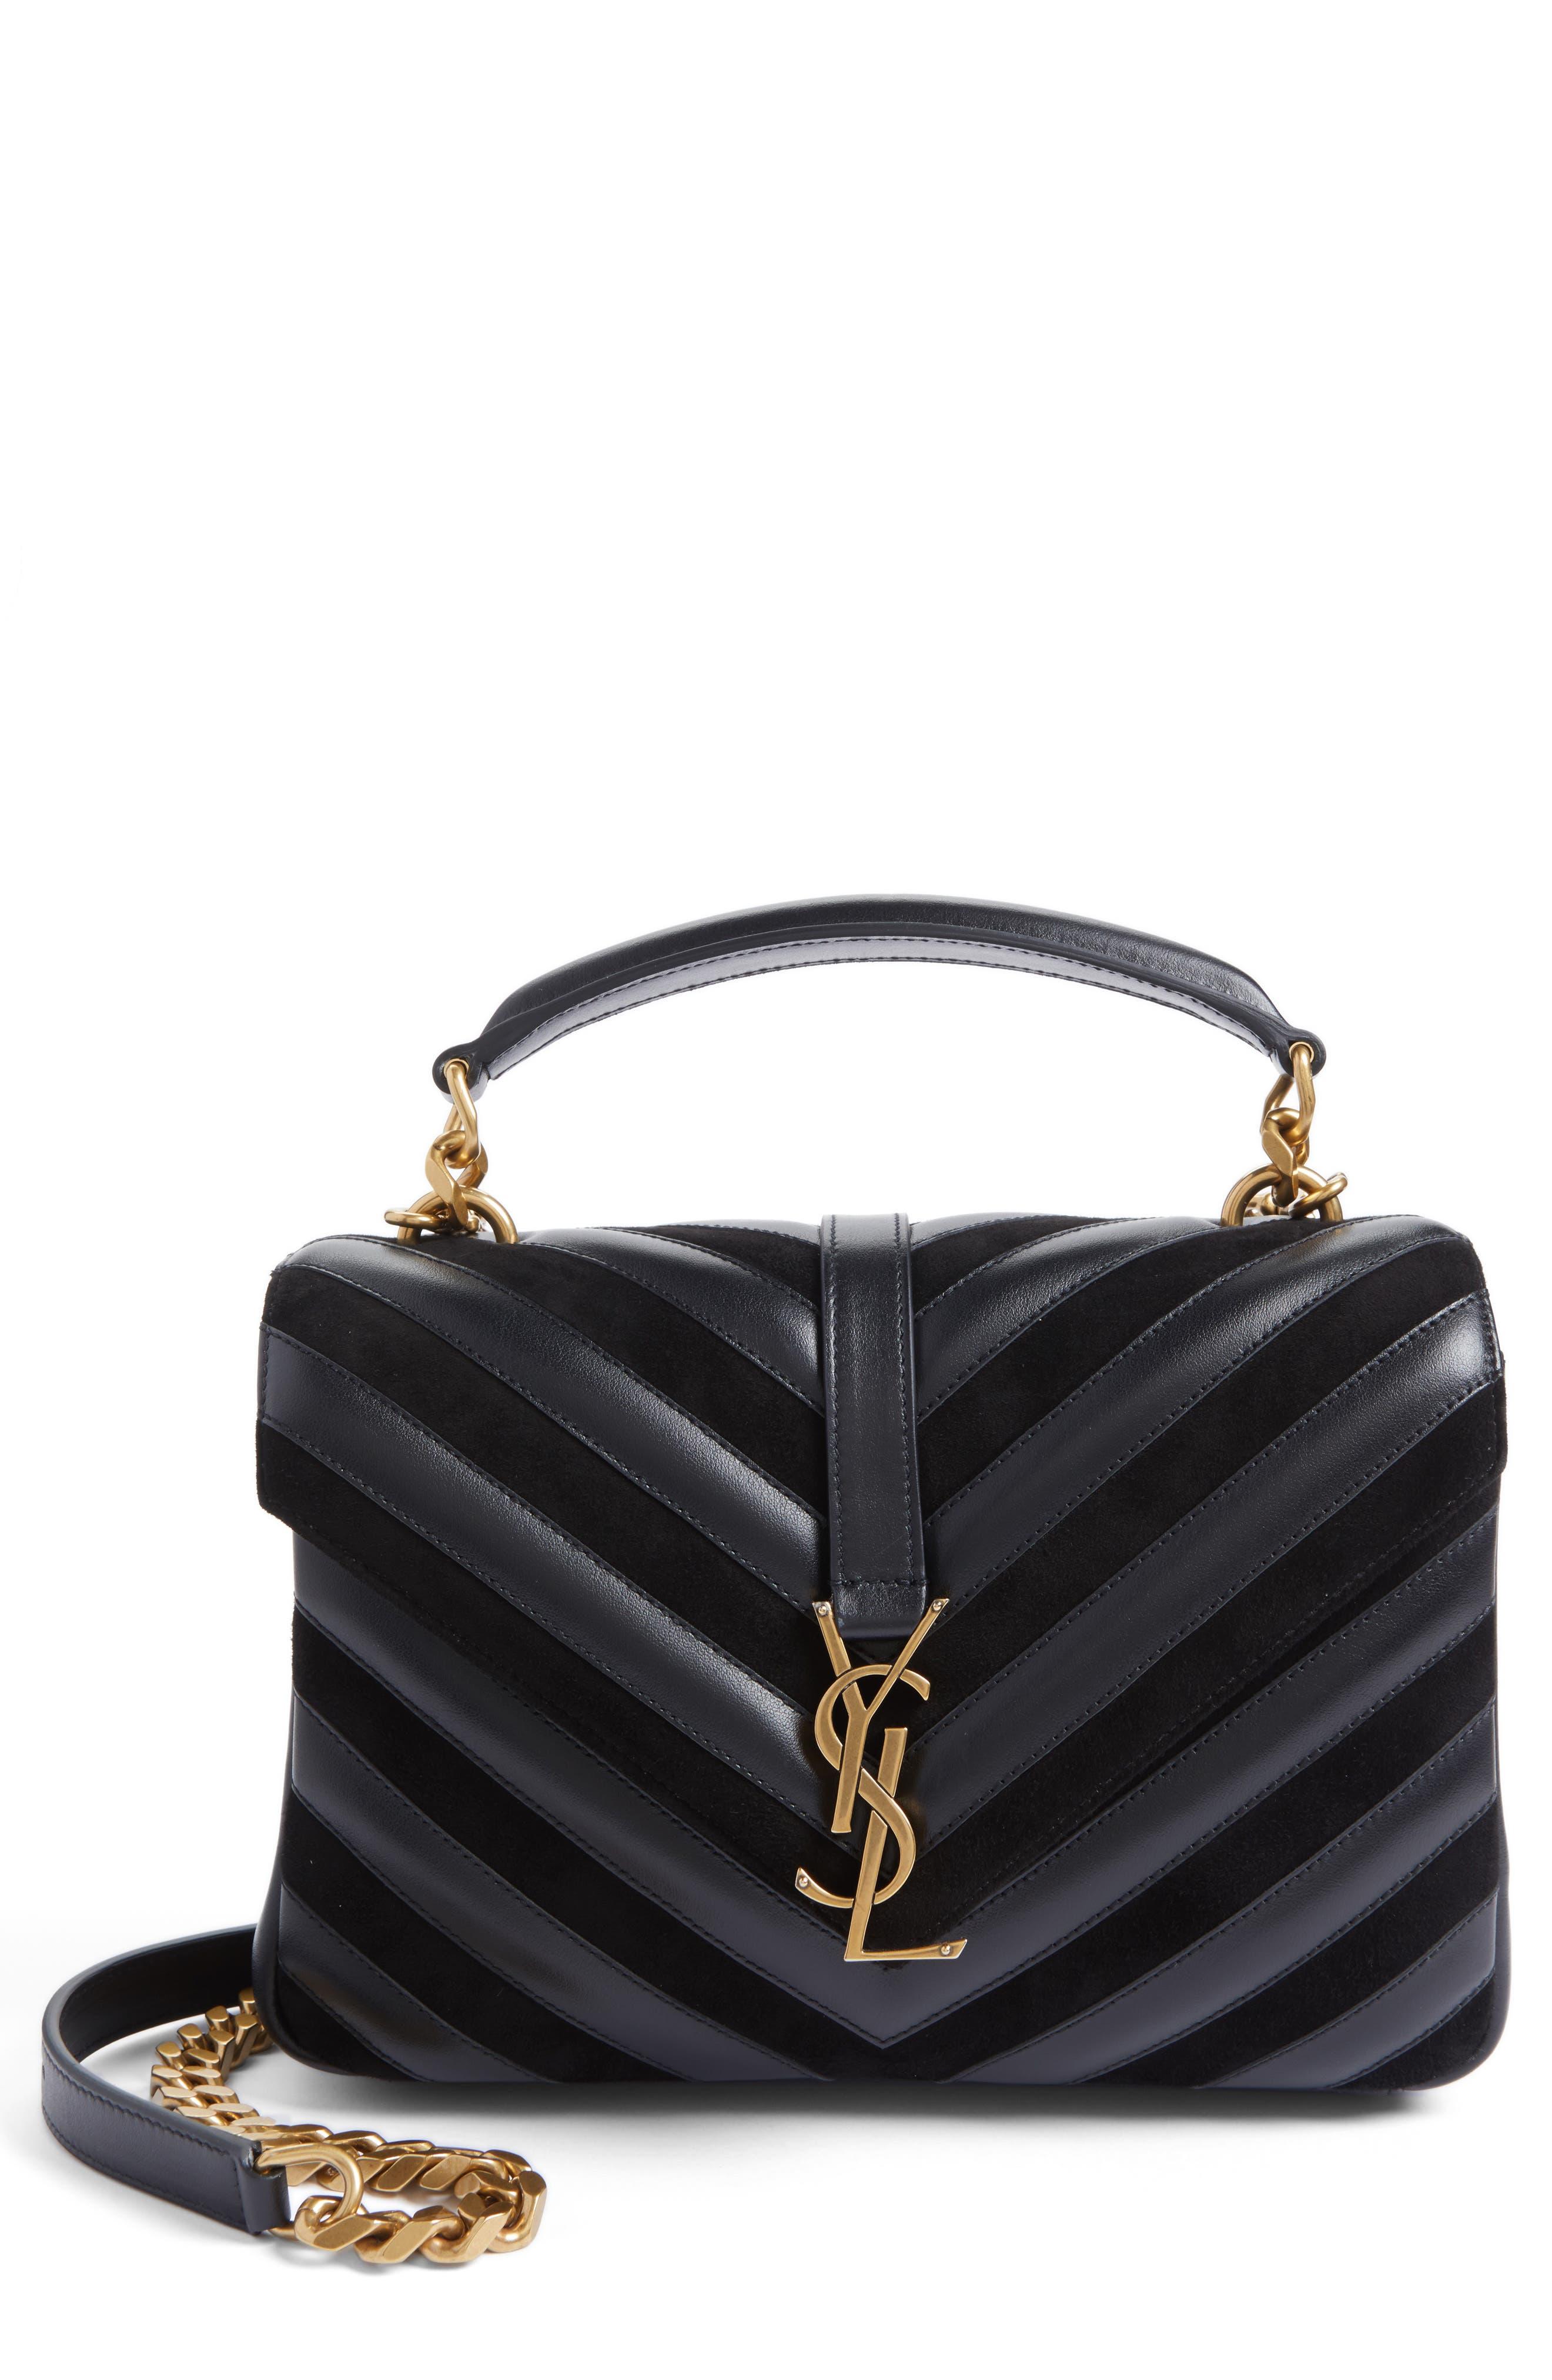 Medium College Patchwork Suede & Leather Shoulder Bag,                             Main thumbnail 1, color,                             001